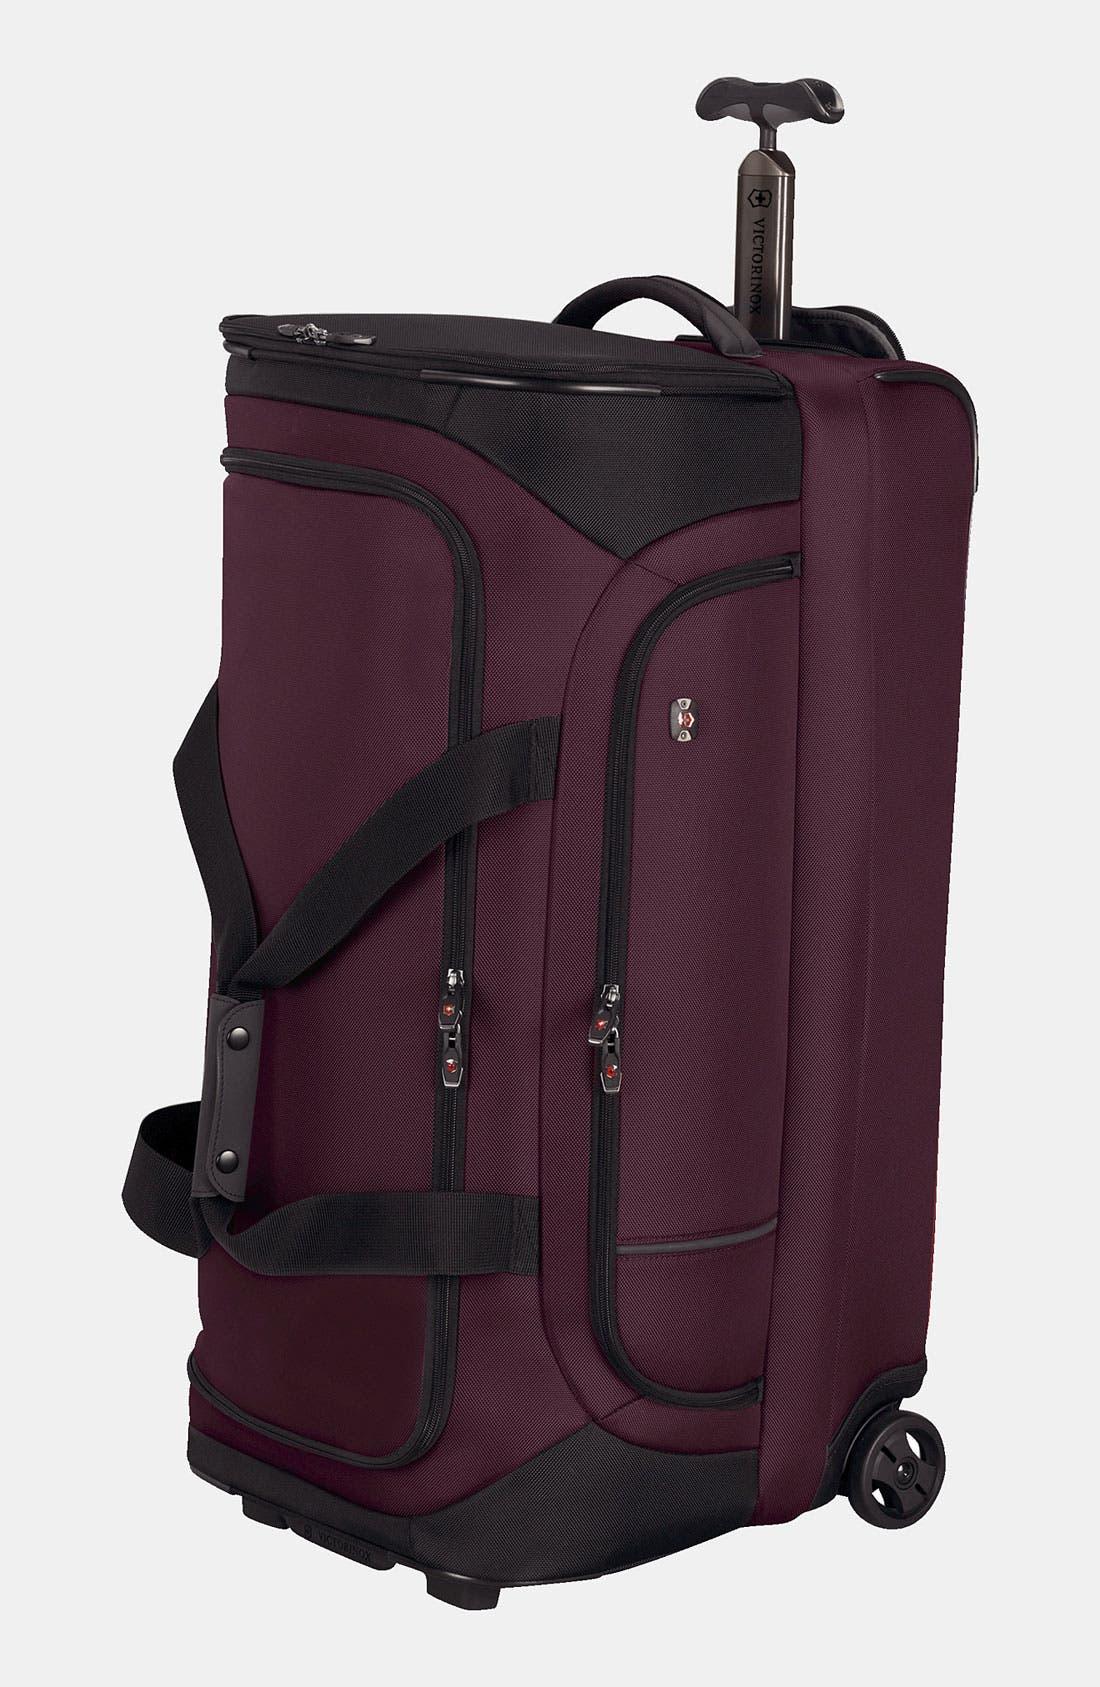 Alternate Image 1 Selected - Victorinox Swiss Army® 'Werks - Traveler' Rolling Duffel Bag (31 Inch)